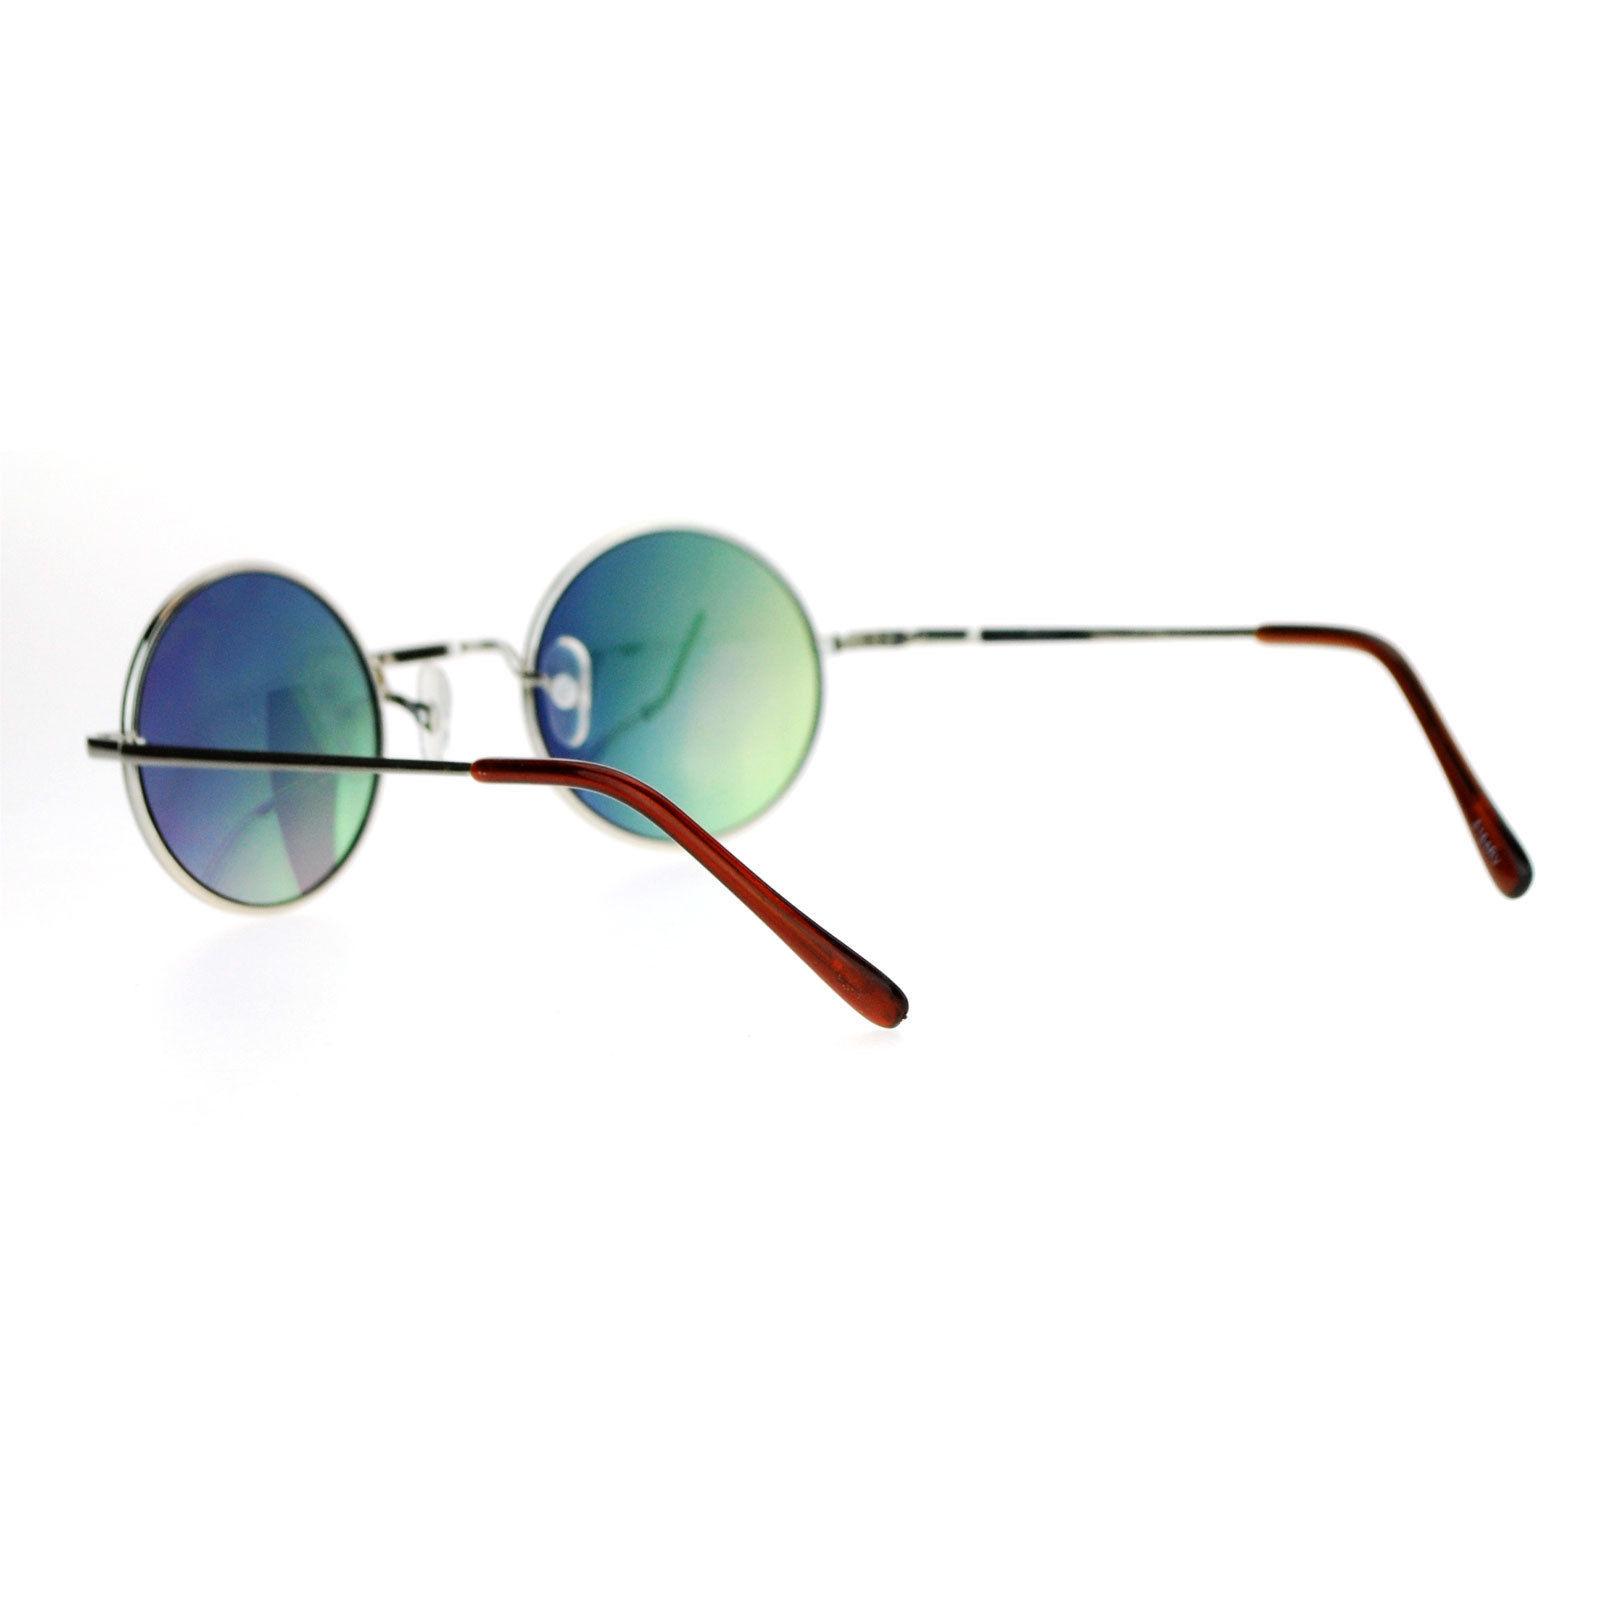 Small Round Circle Frame Sunglasses Metal Spring Hinge Mirror Lens